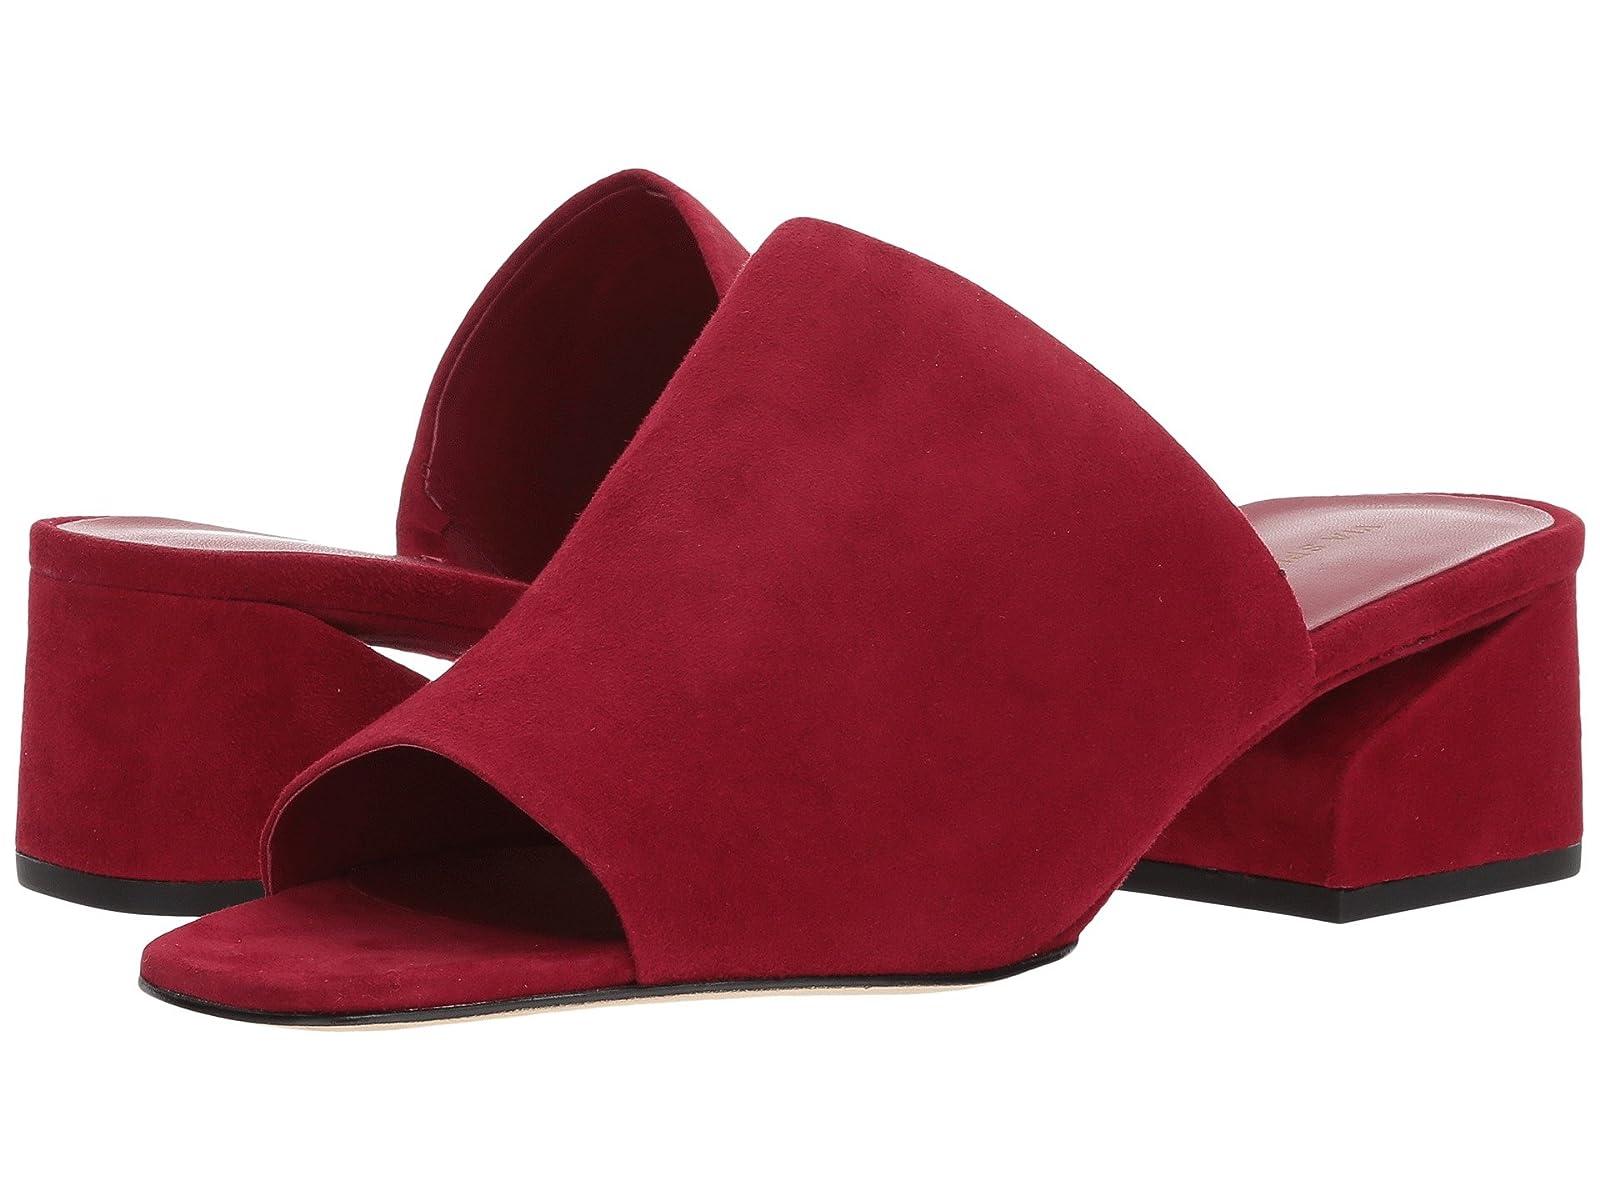 Via Spiga PorterCheap and distinctive eye-catching shoes